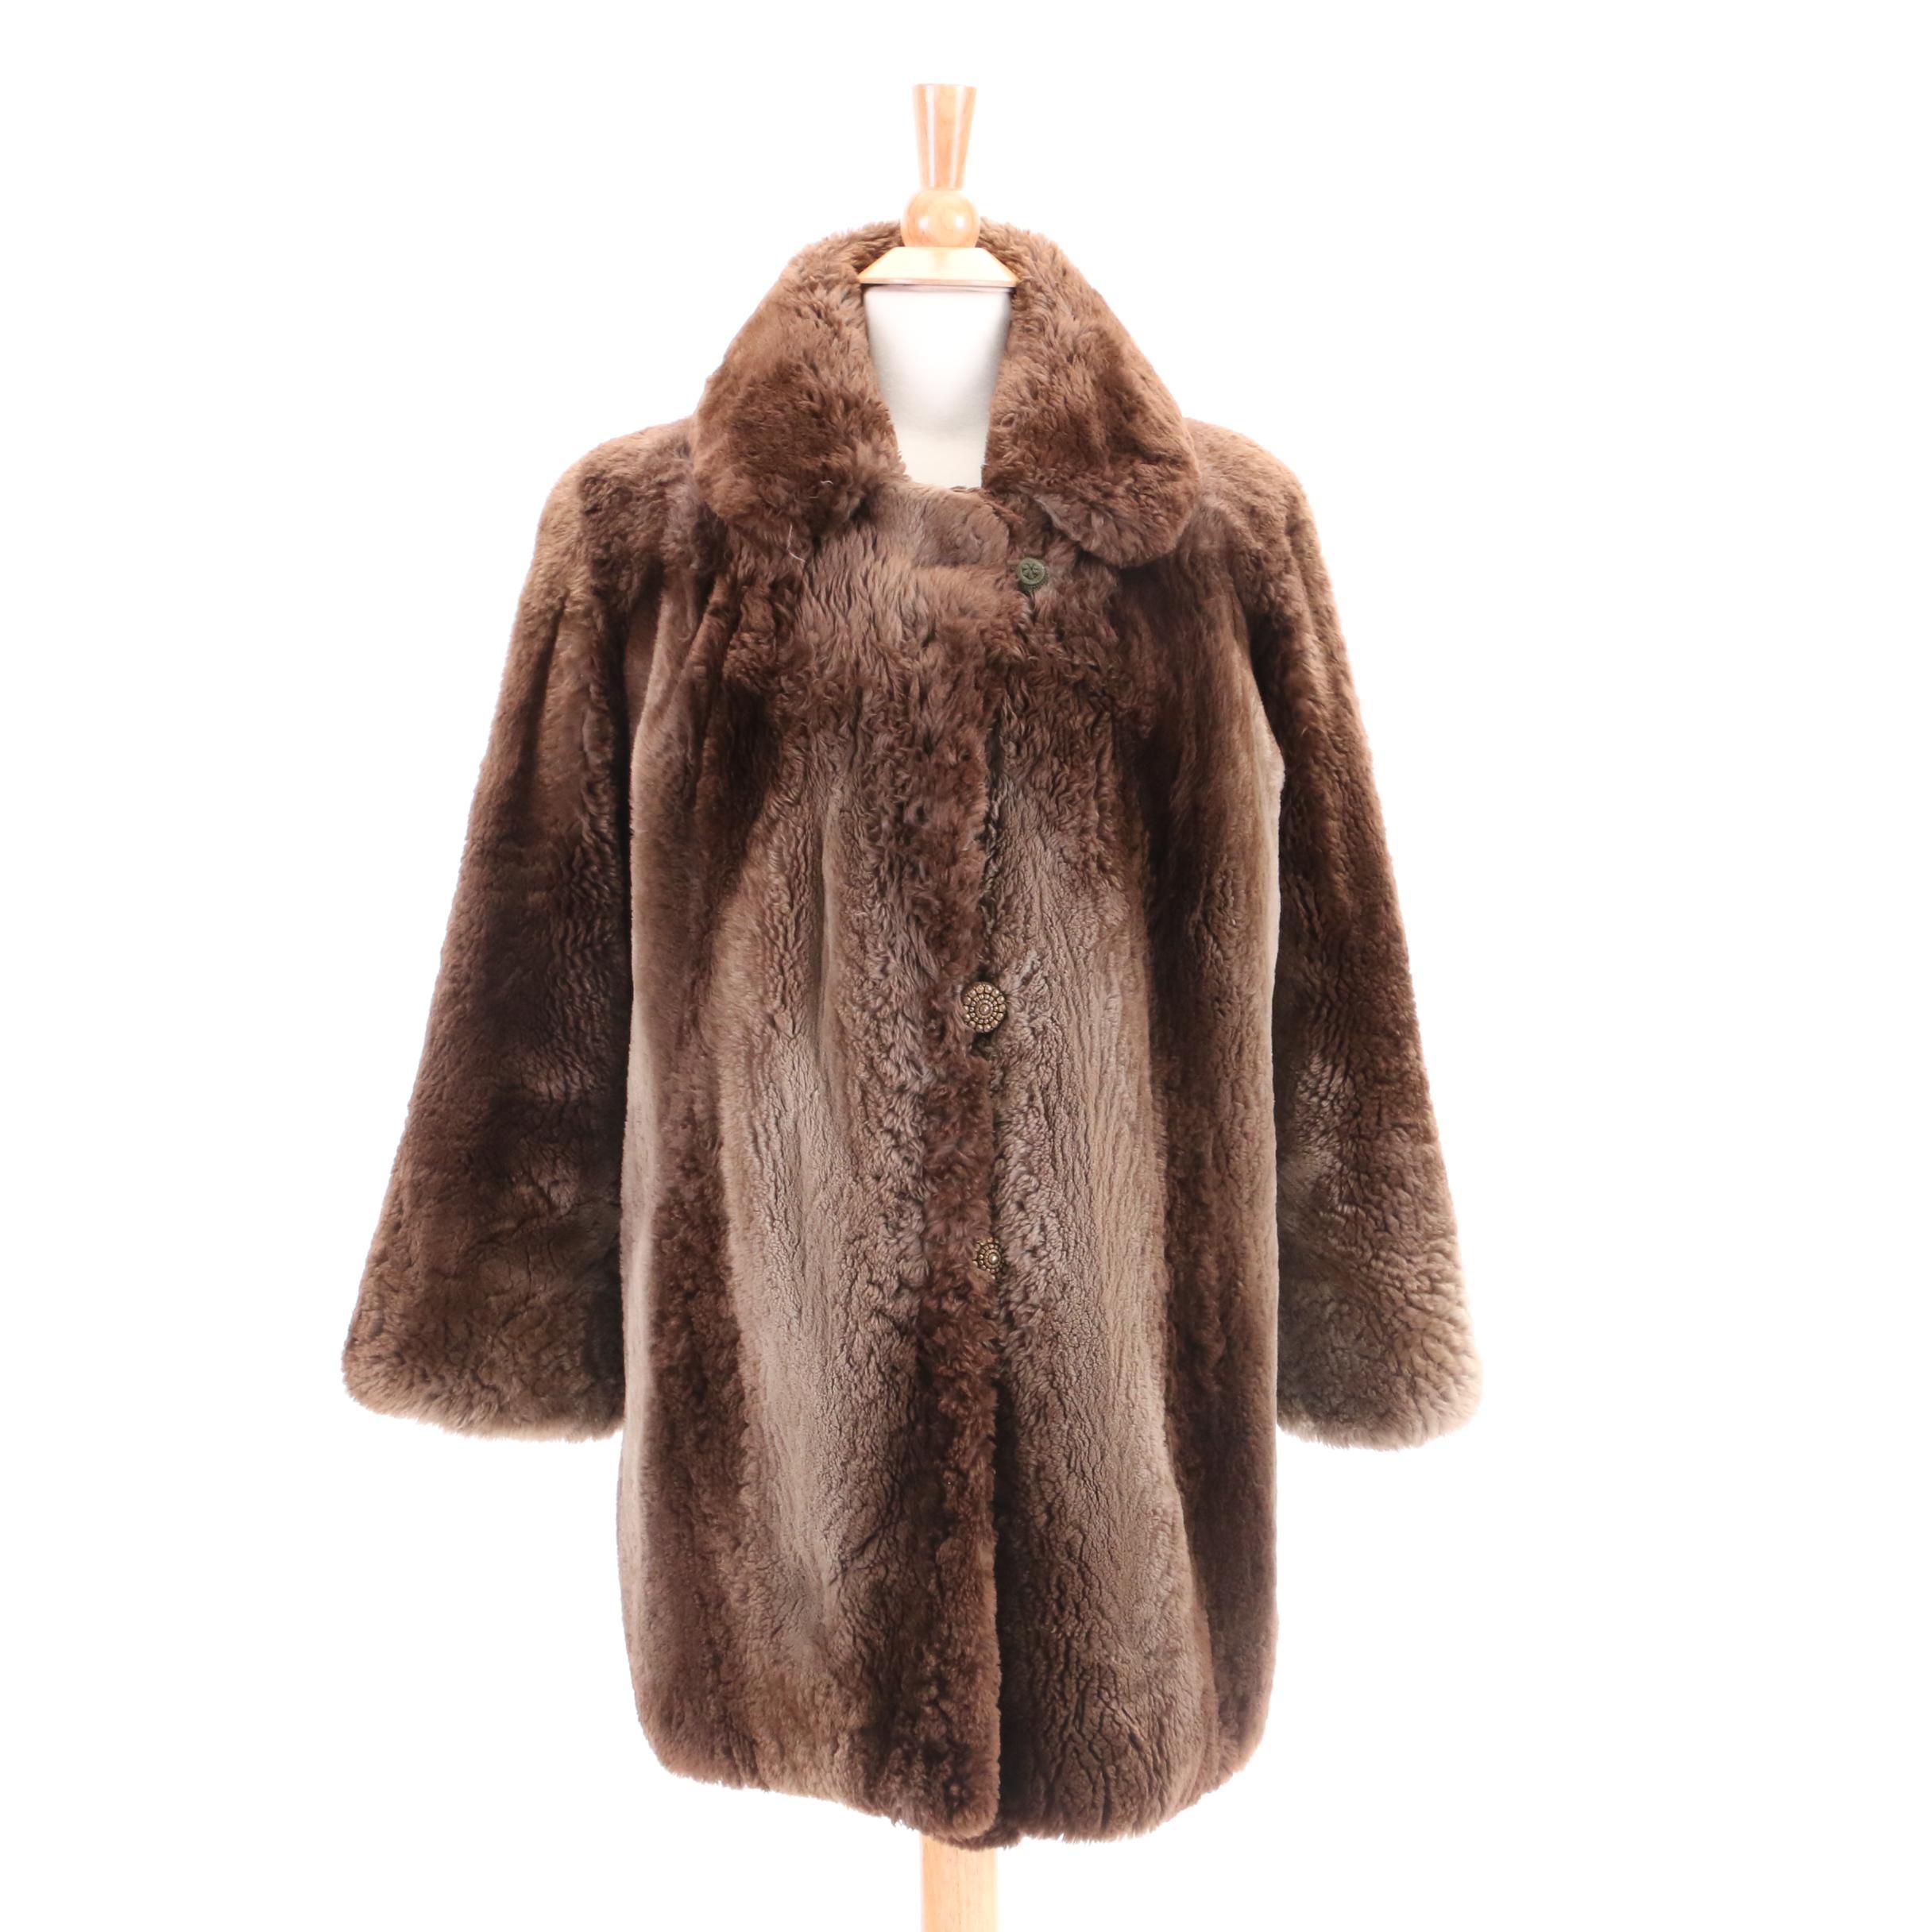 Circa 1960s Vintage Levine & Rosenberg Sheared Beaver Fur Coat